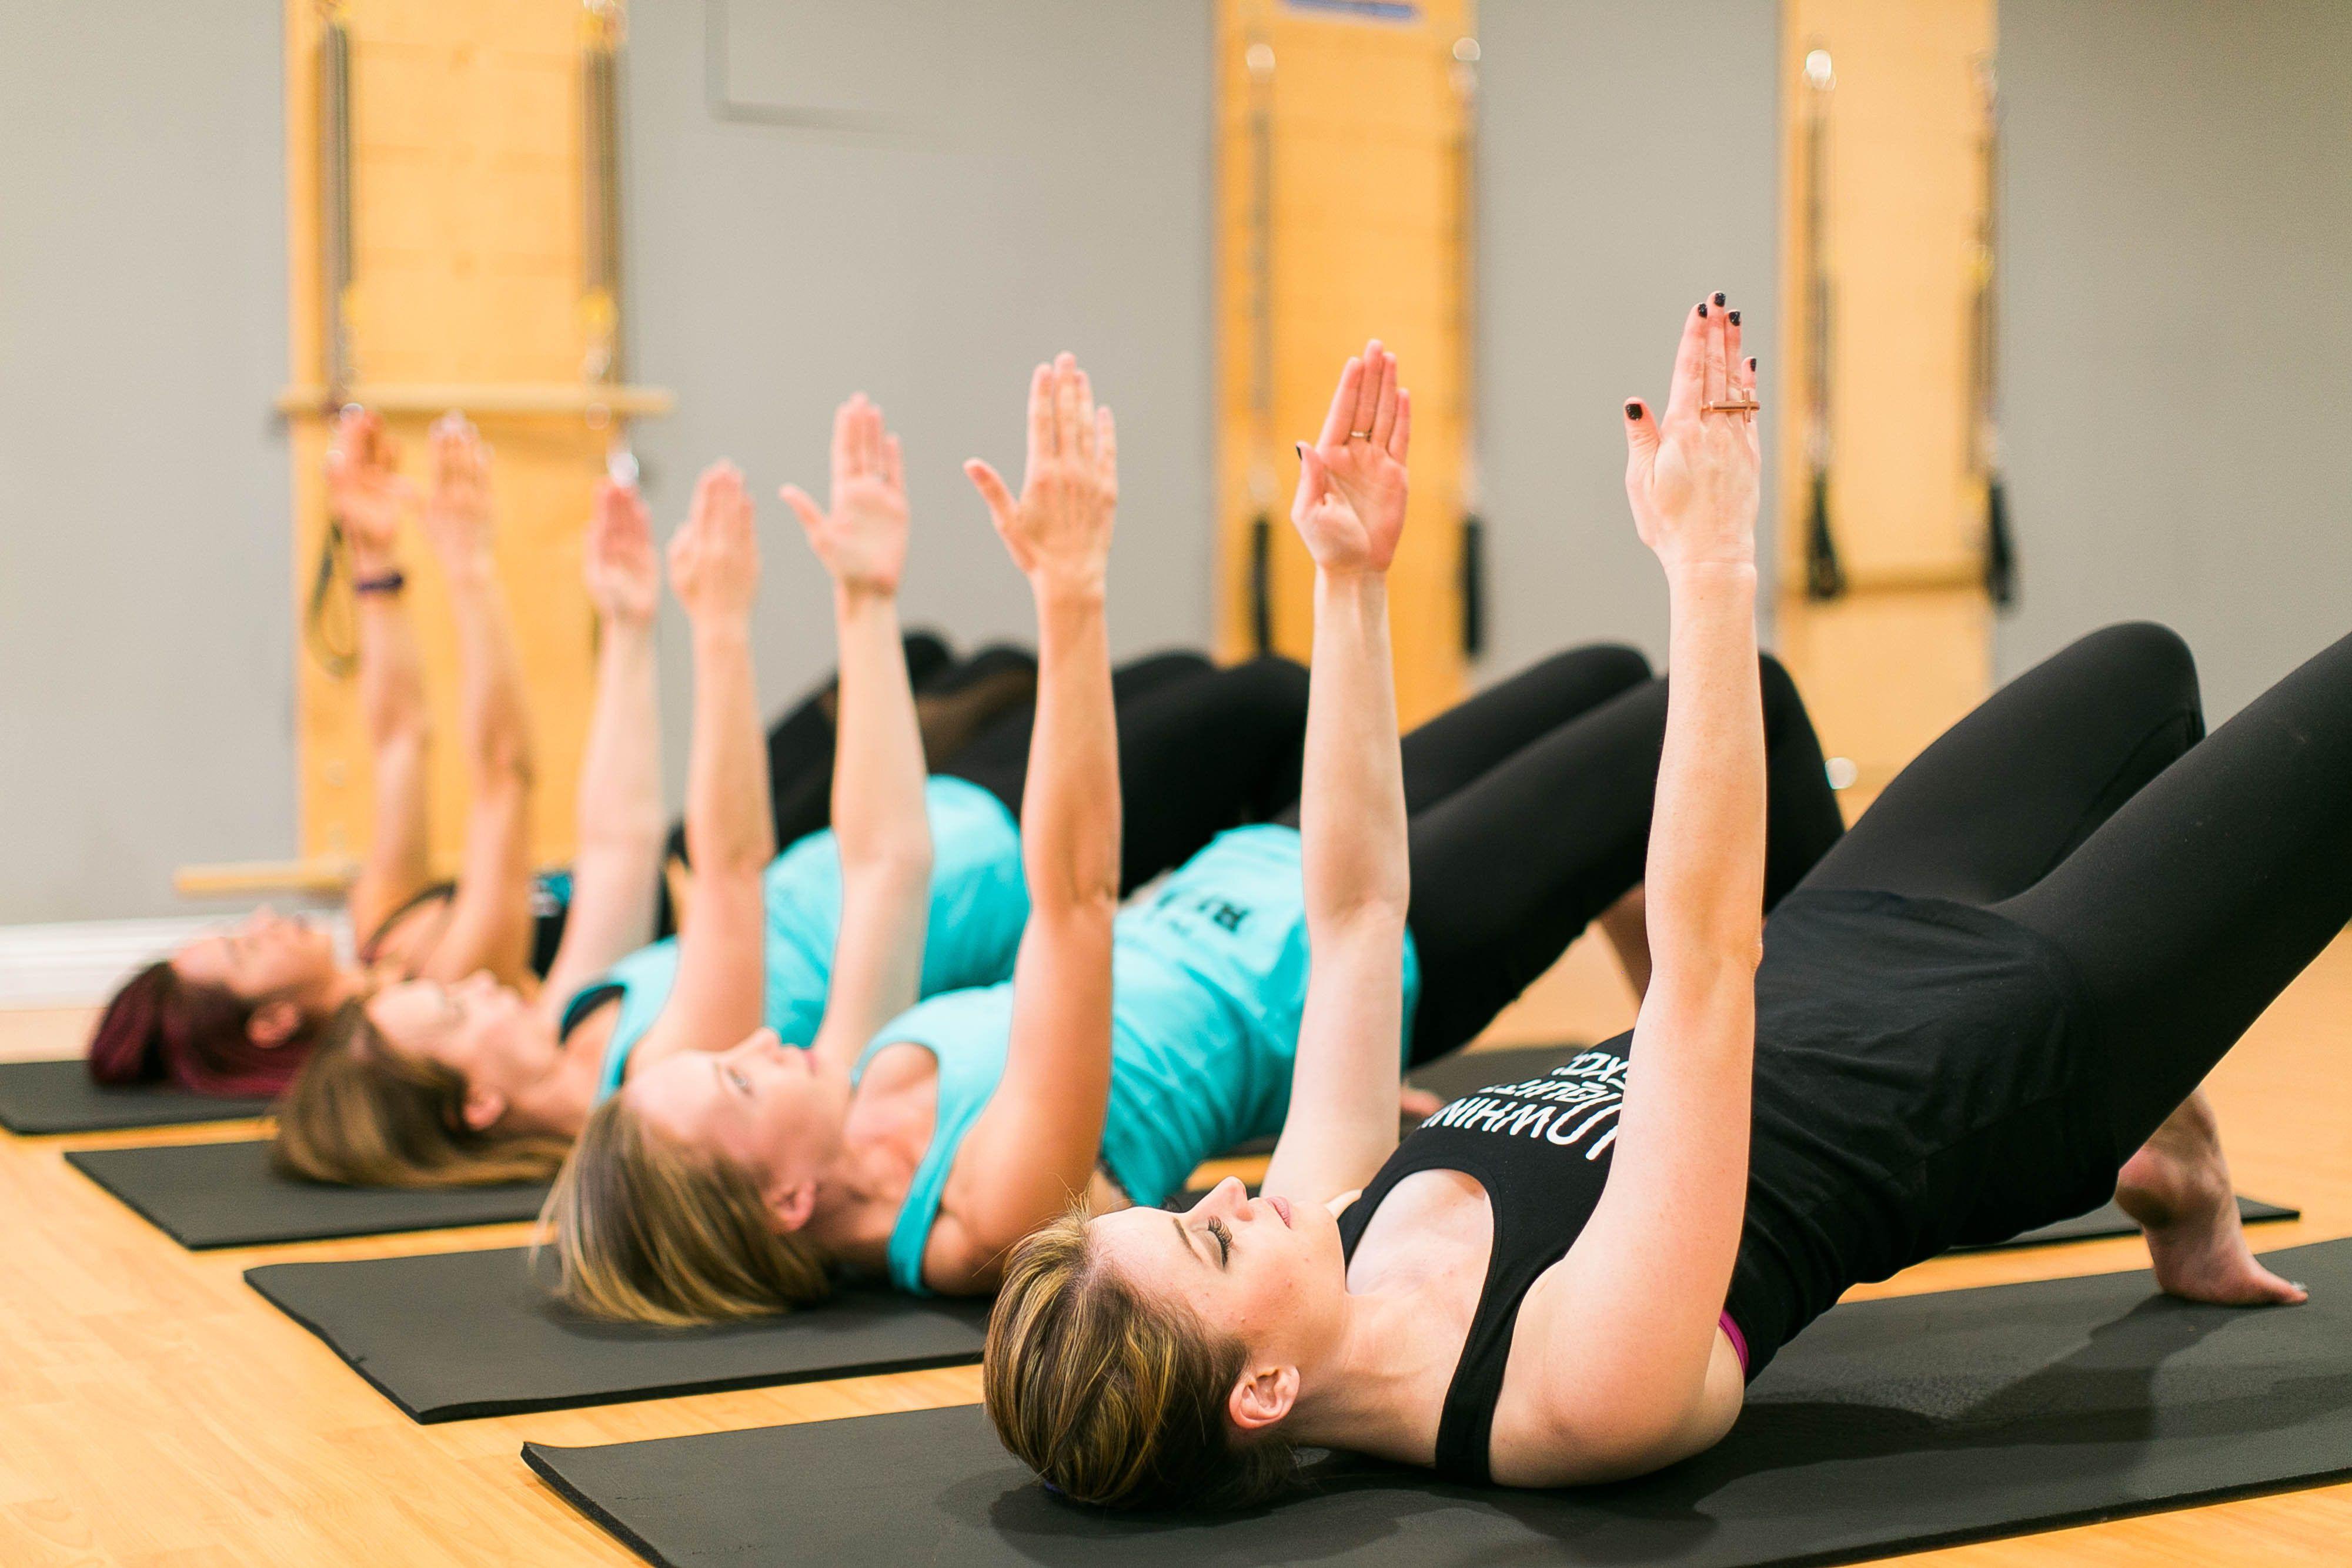 Pin by tasha ingram on occupational health pilates mat